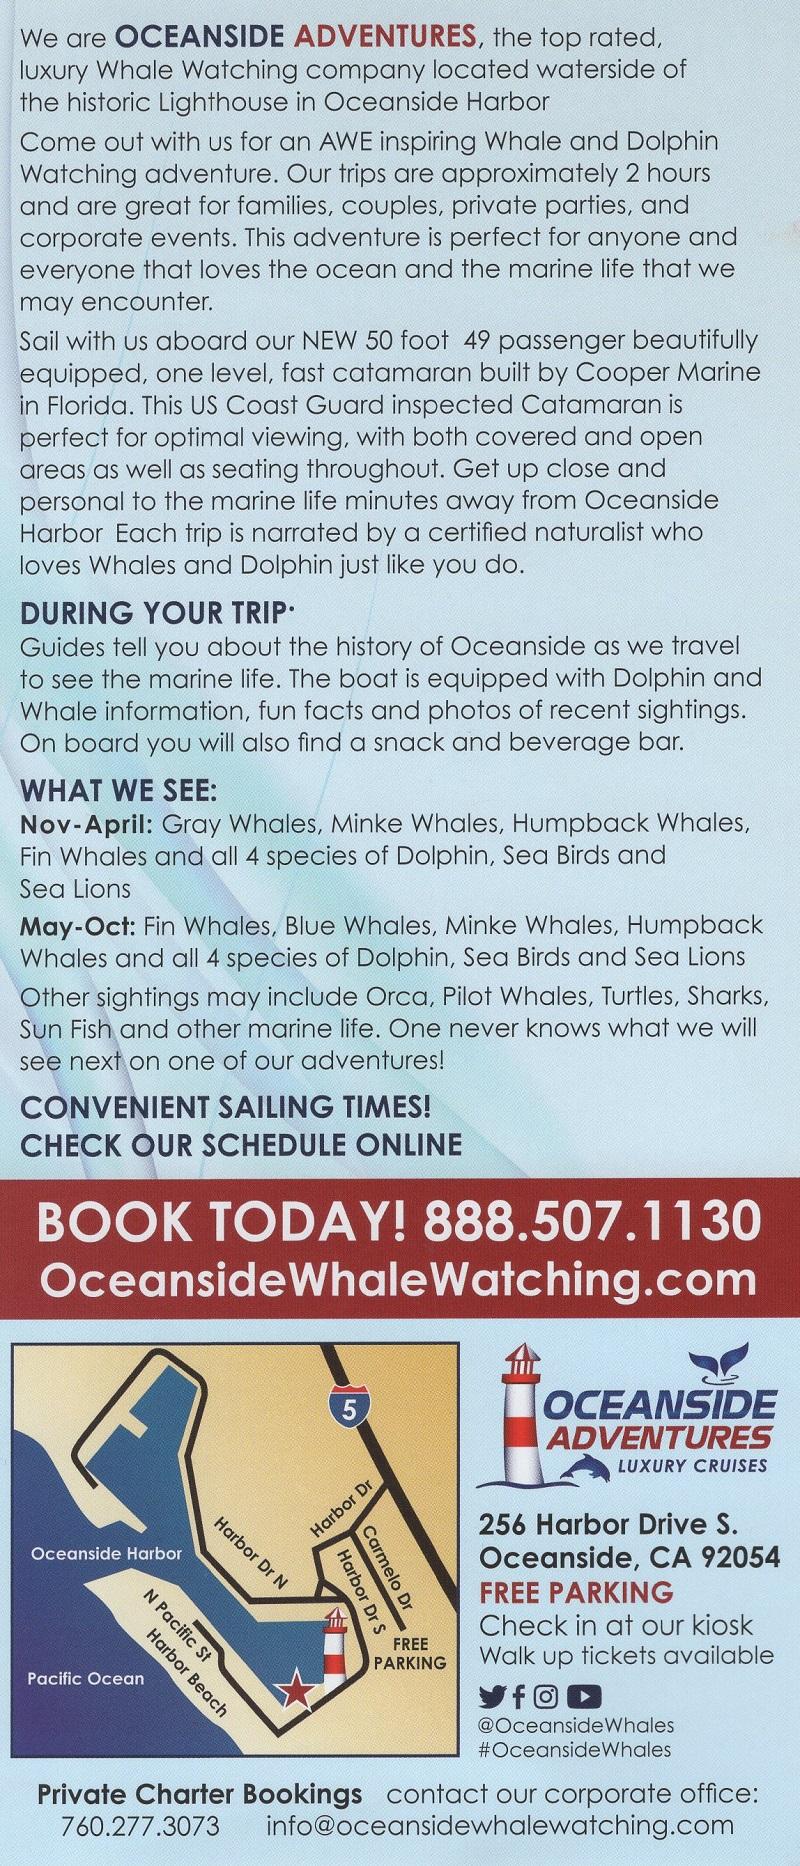 Oceanside Adventures brochure thumbnail